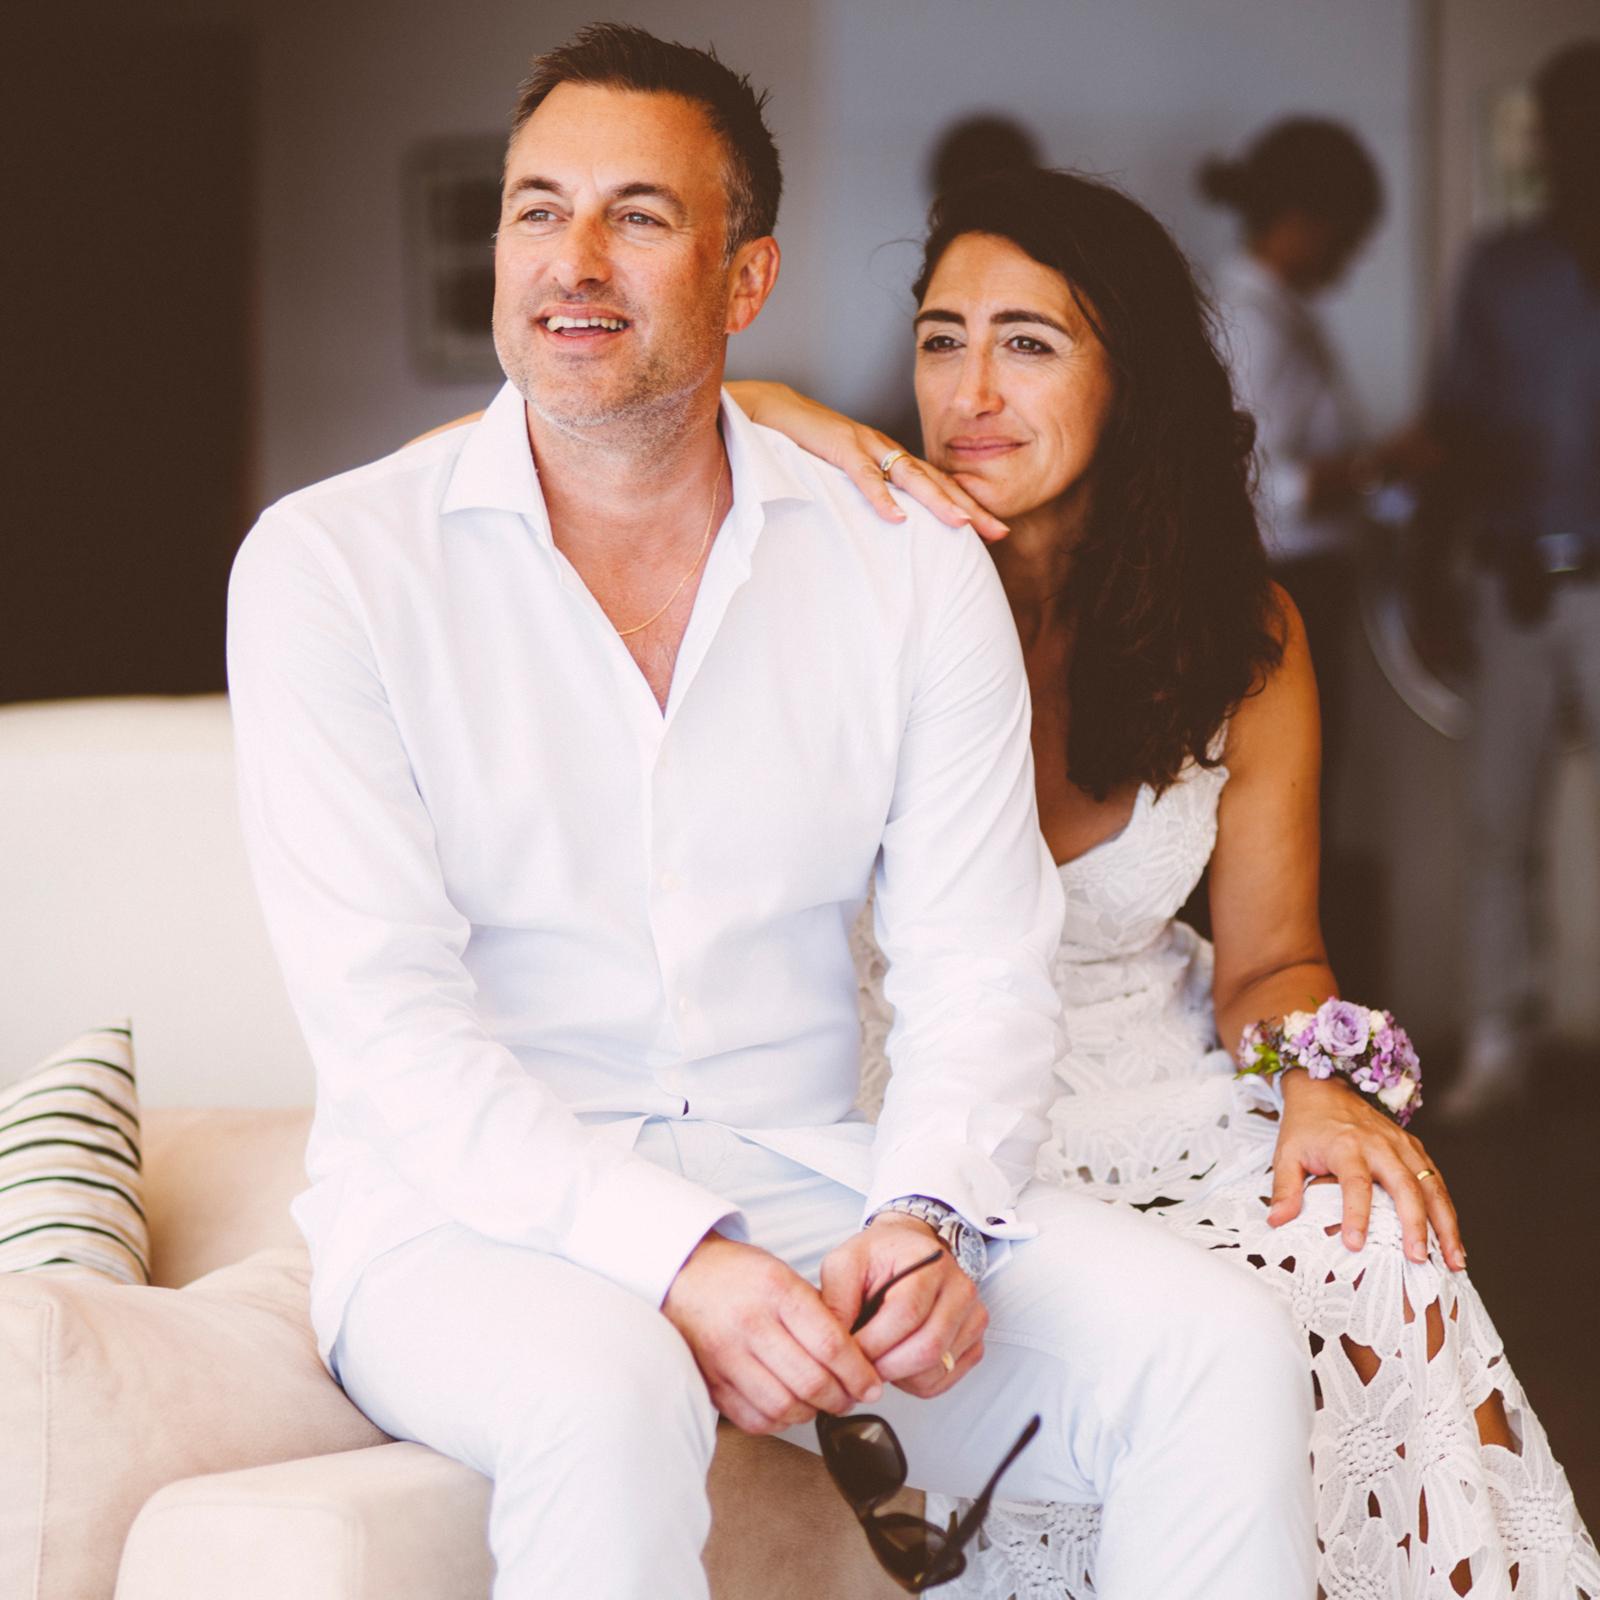 Hochzeitsfotograf_Ibiza_120.jpg